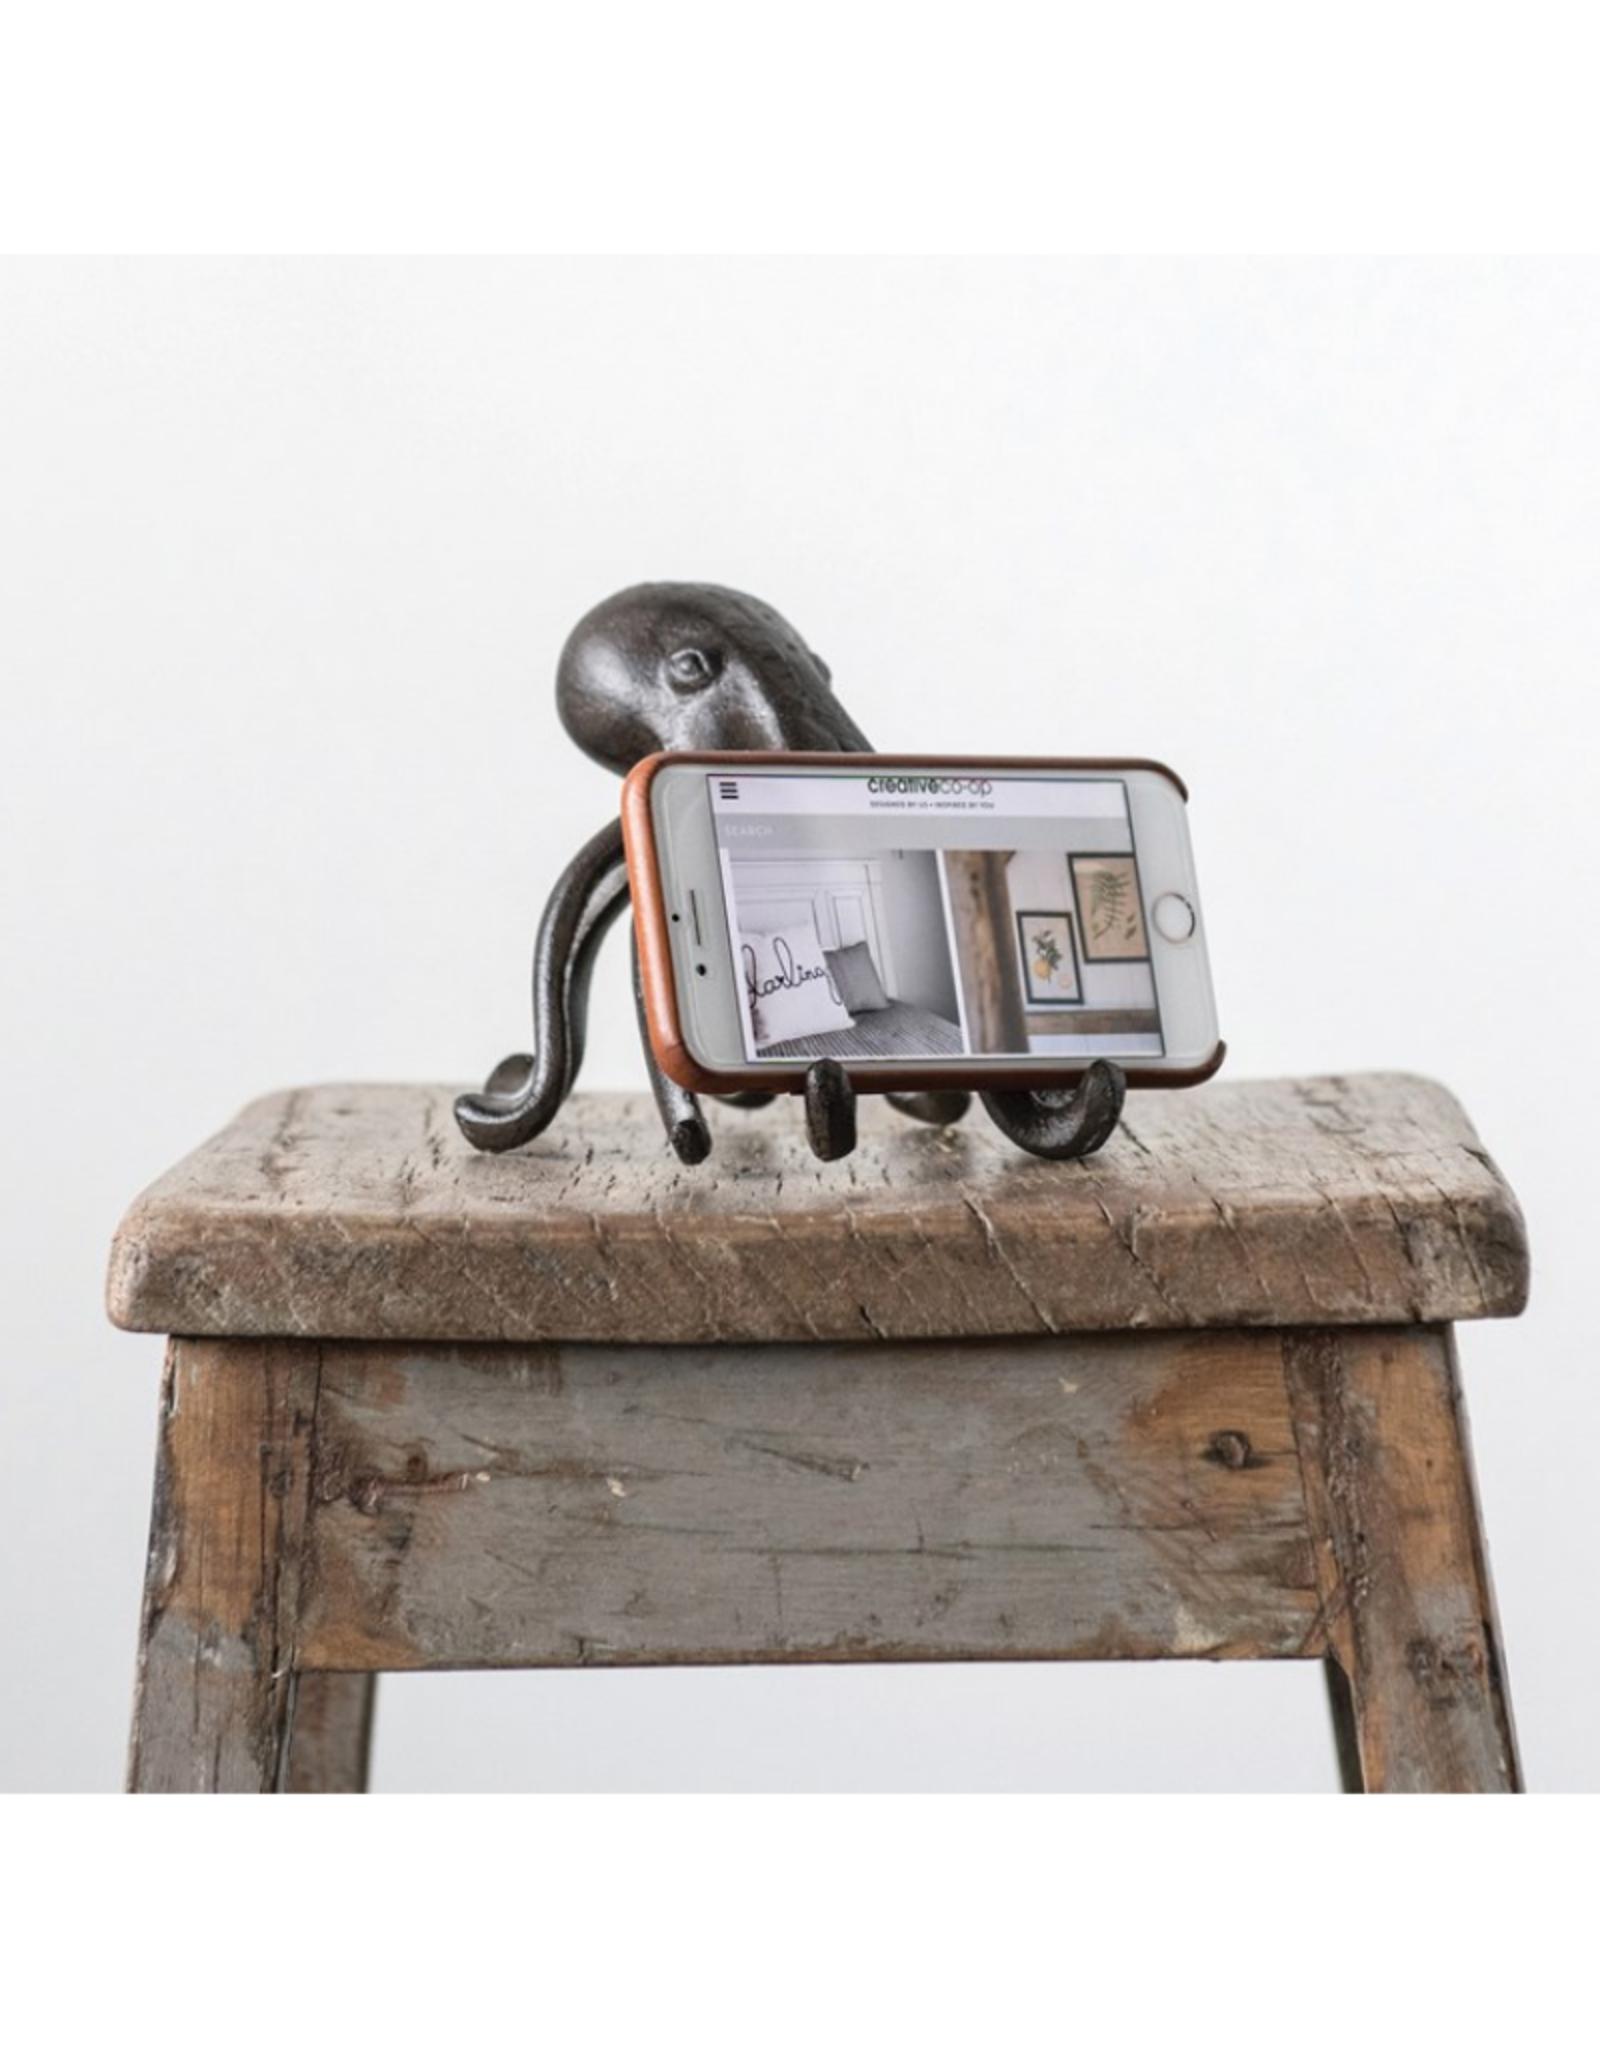 PHONE STAND-CAST IRON-OCTOPUS, 6'x5-1/4'x4-3/4'